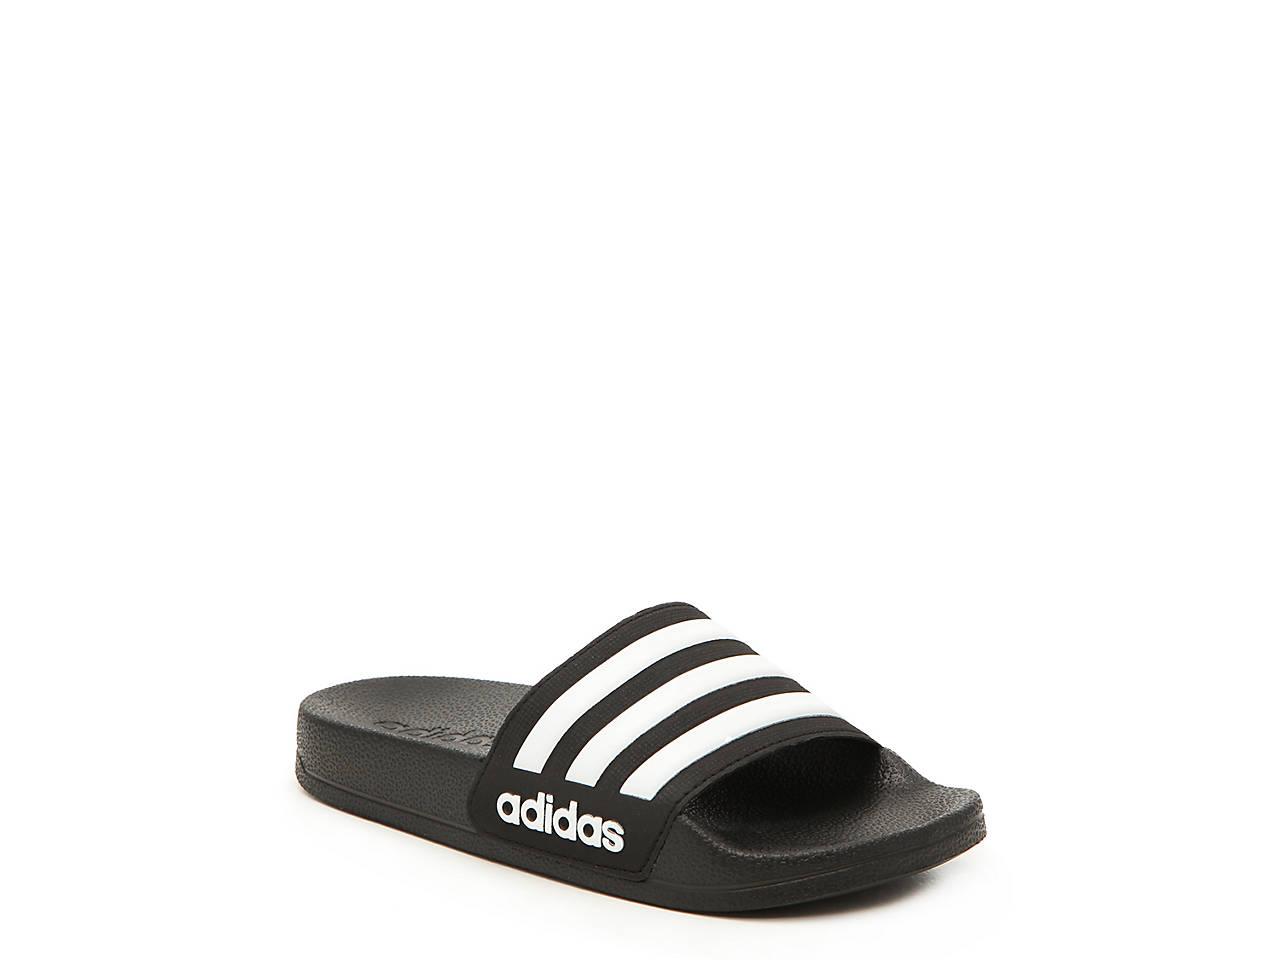 6b7d36379837 adidas Adilette Shower Toddler   Youth Slide Sandal Kids Shoes